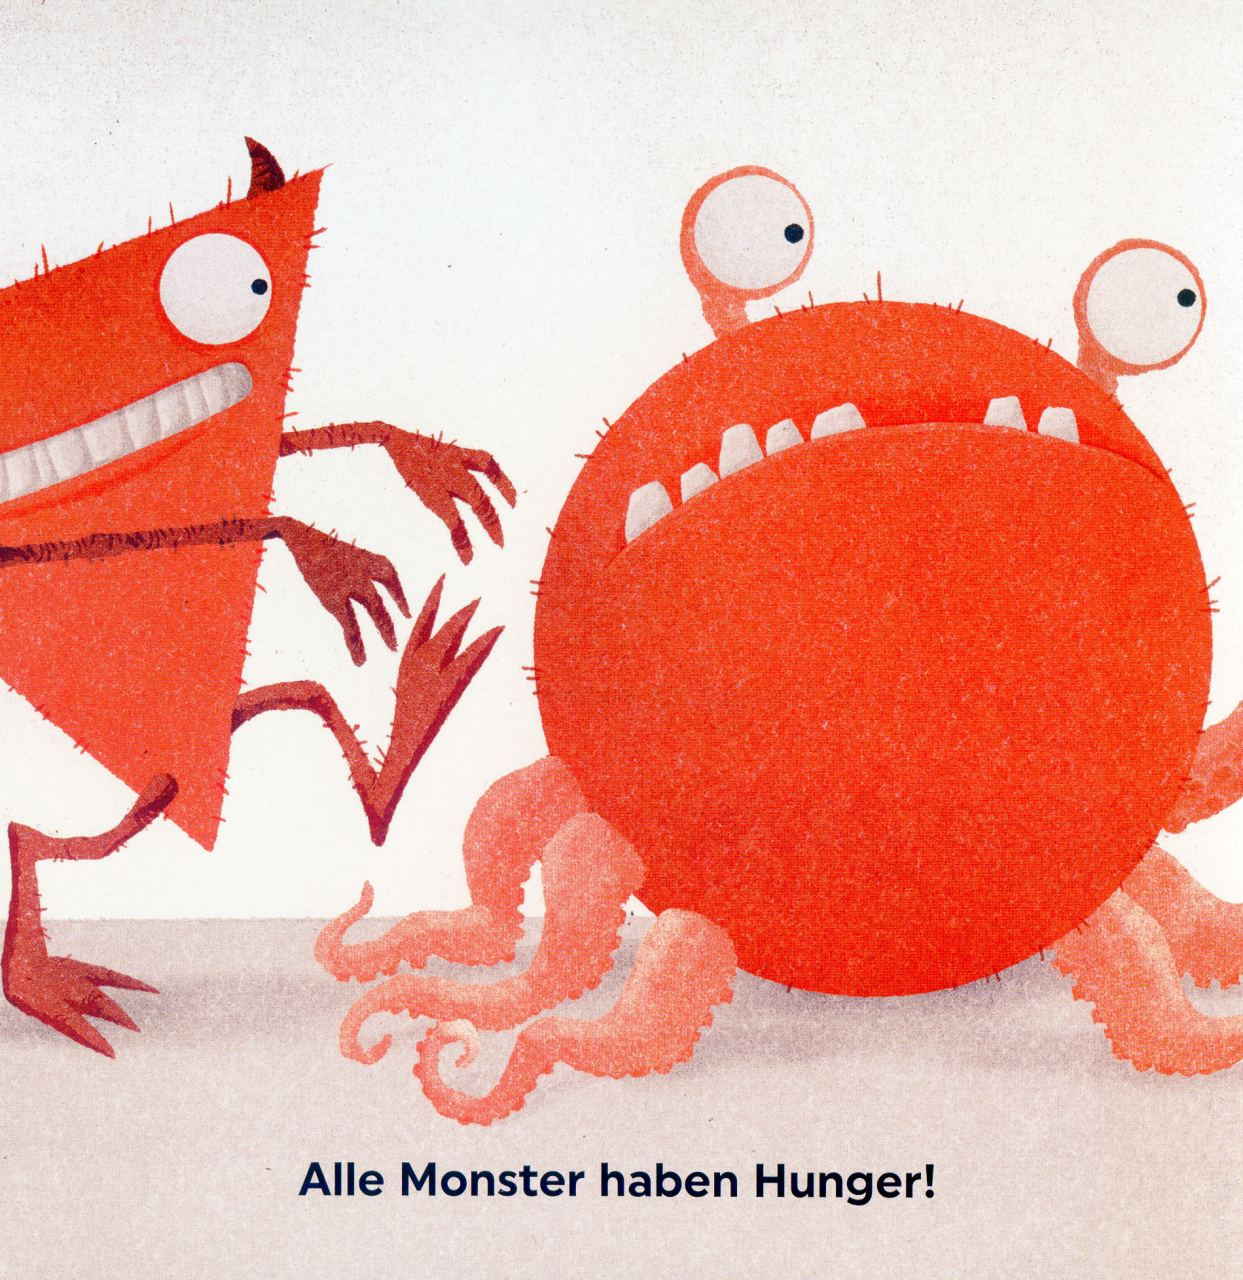 Monstermampf